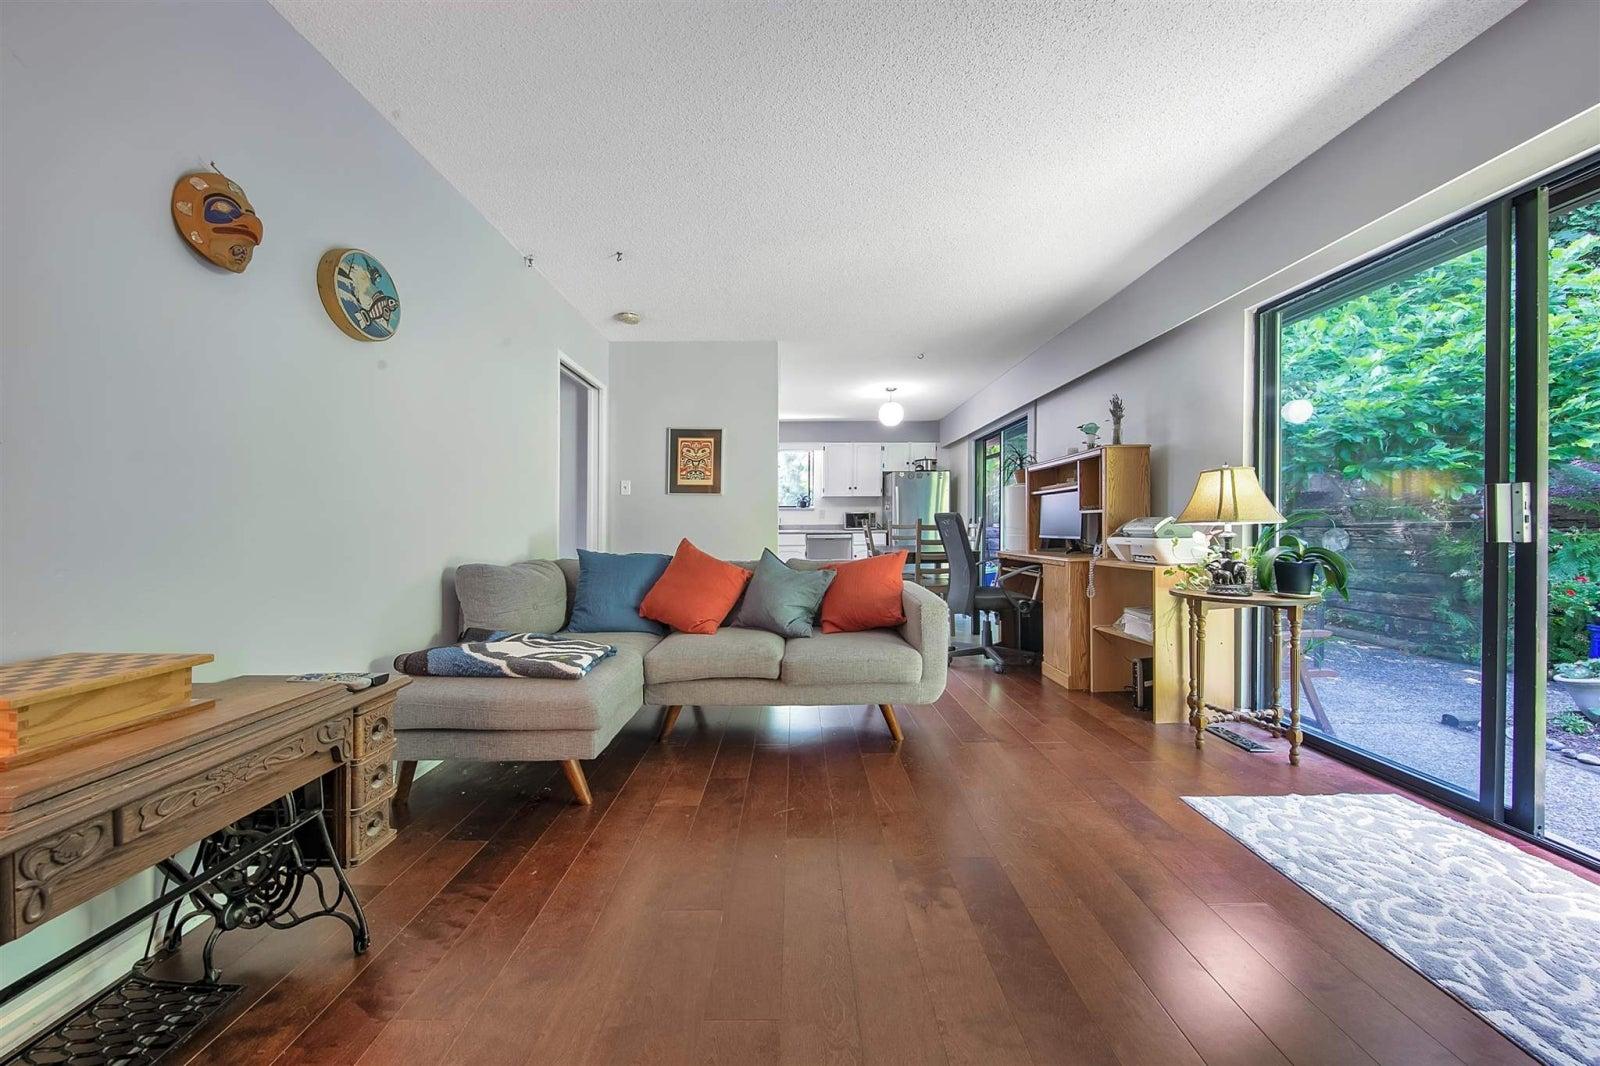 843 REDDINGTON COURT - Ranch Park House/Single Family for sale, 5 Bedrooms (R2602360) #13